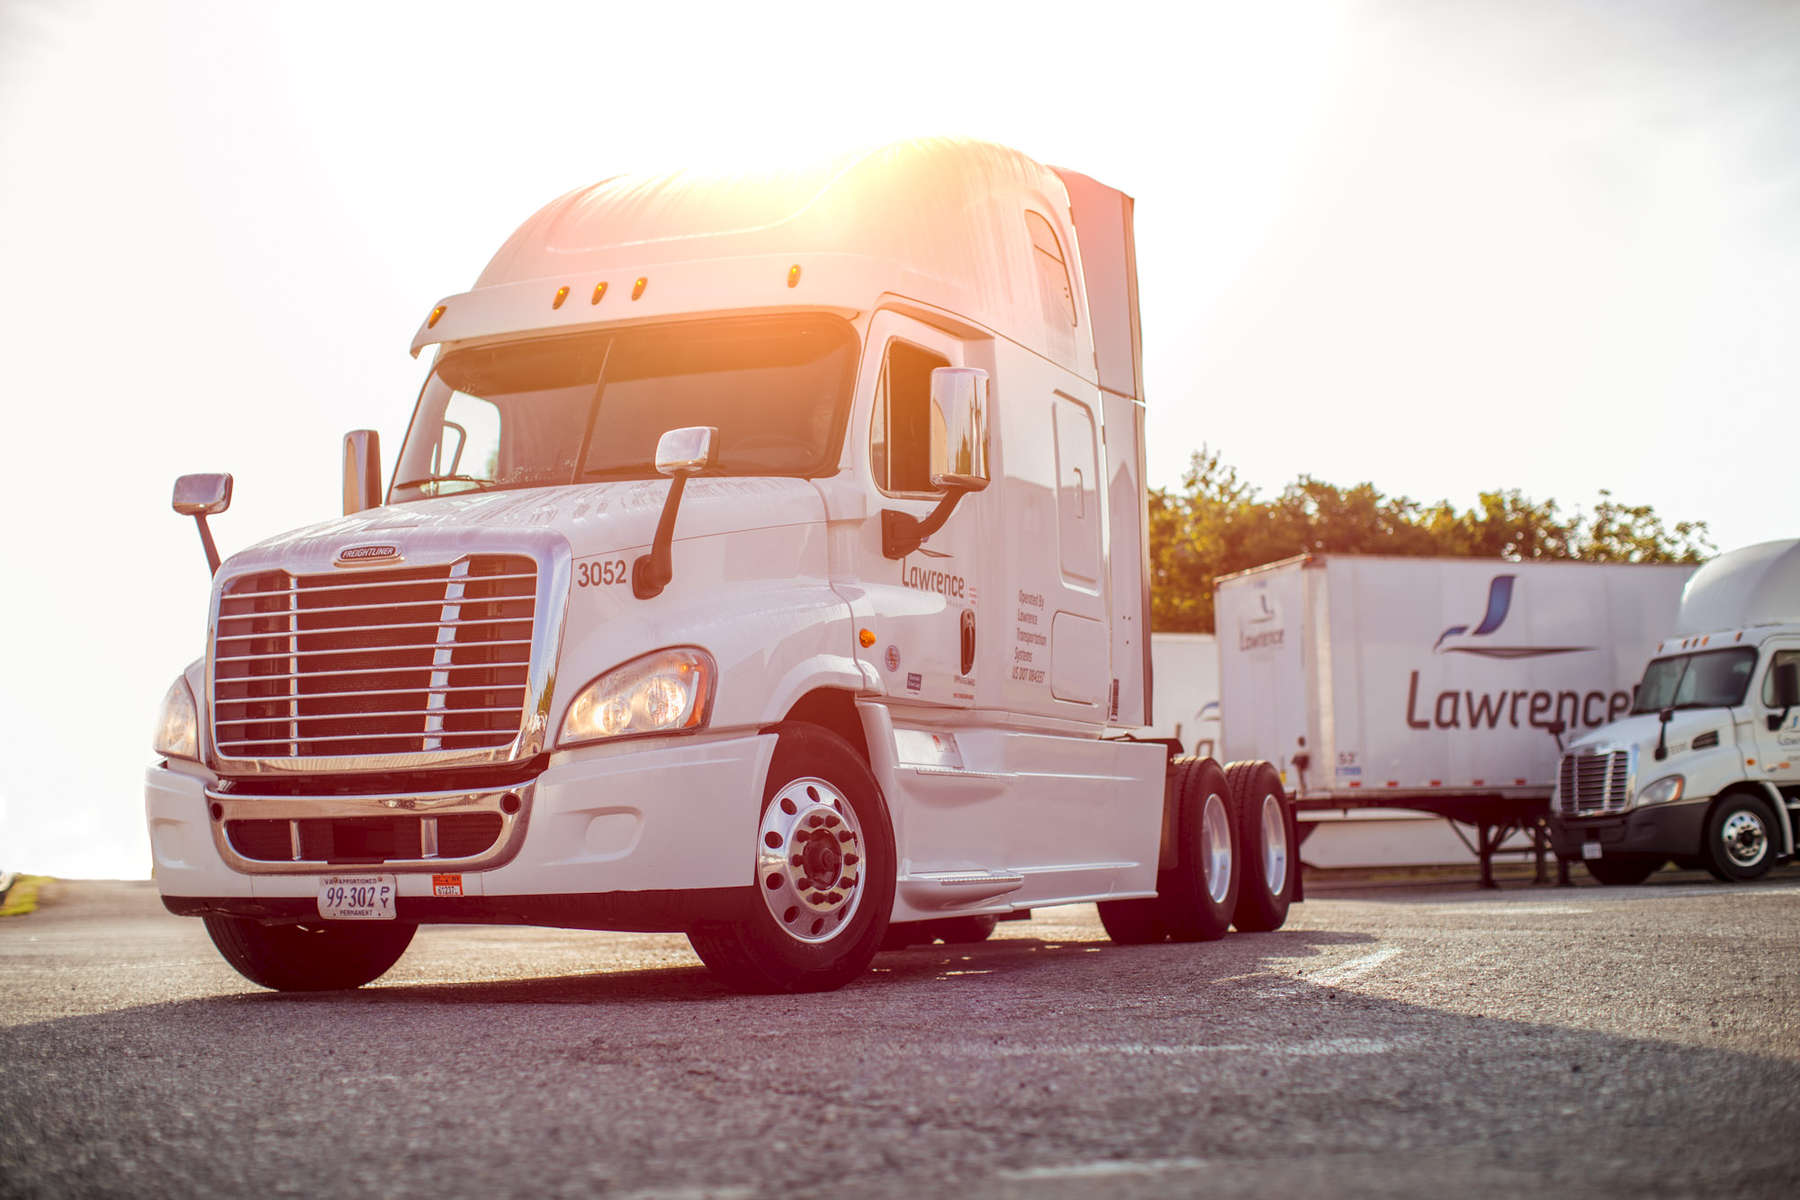 052018-0009-edit-lawrence-trucking-Edit